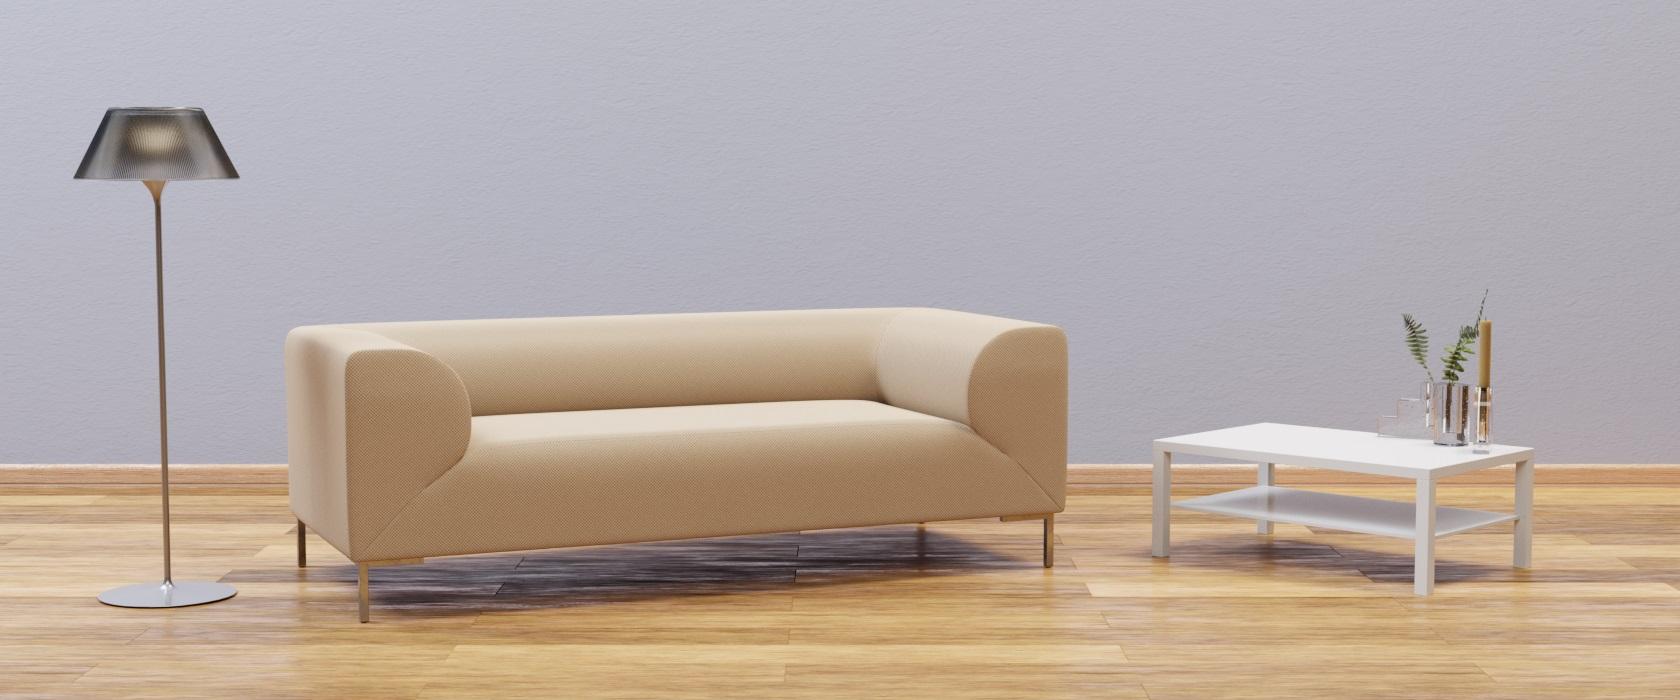 Двухместный диван Fernando - Фото 2 - Pufetto